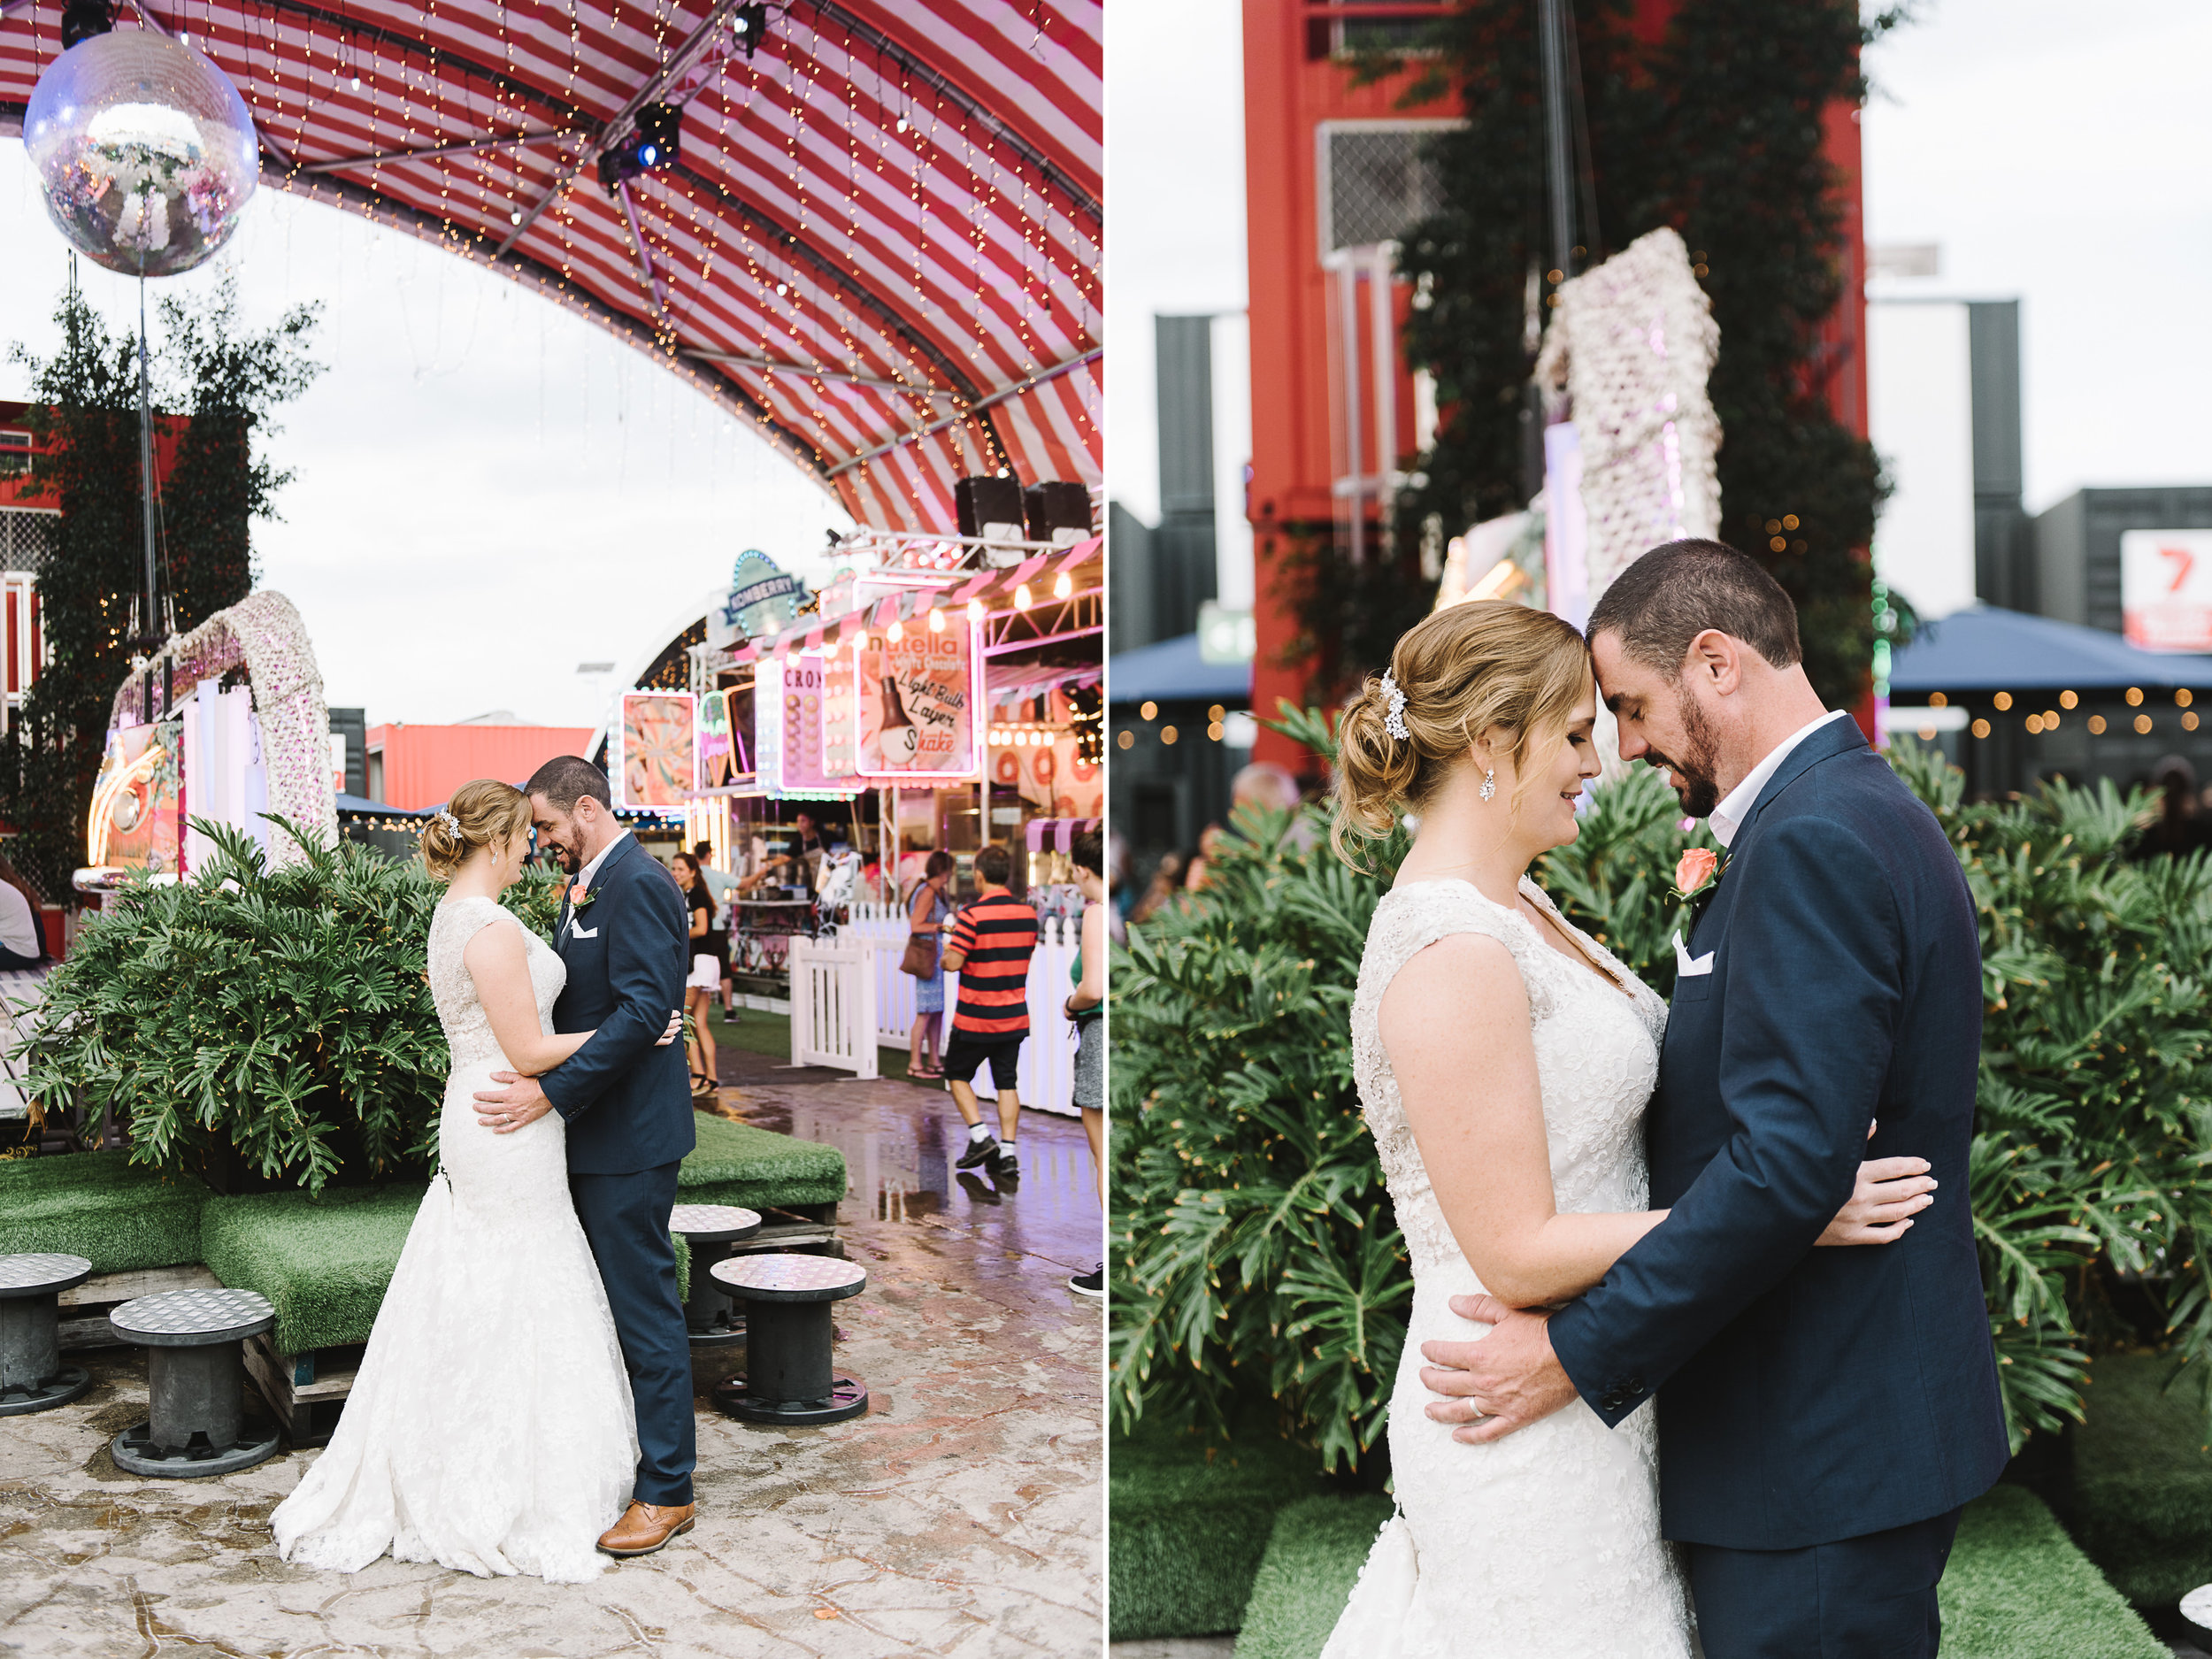 Eat-Street-Market-Wedding-7.jpg